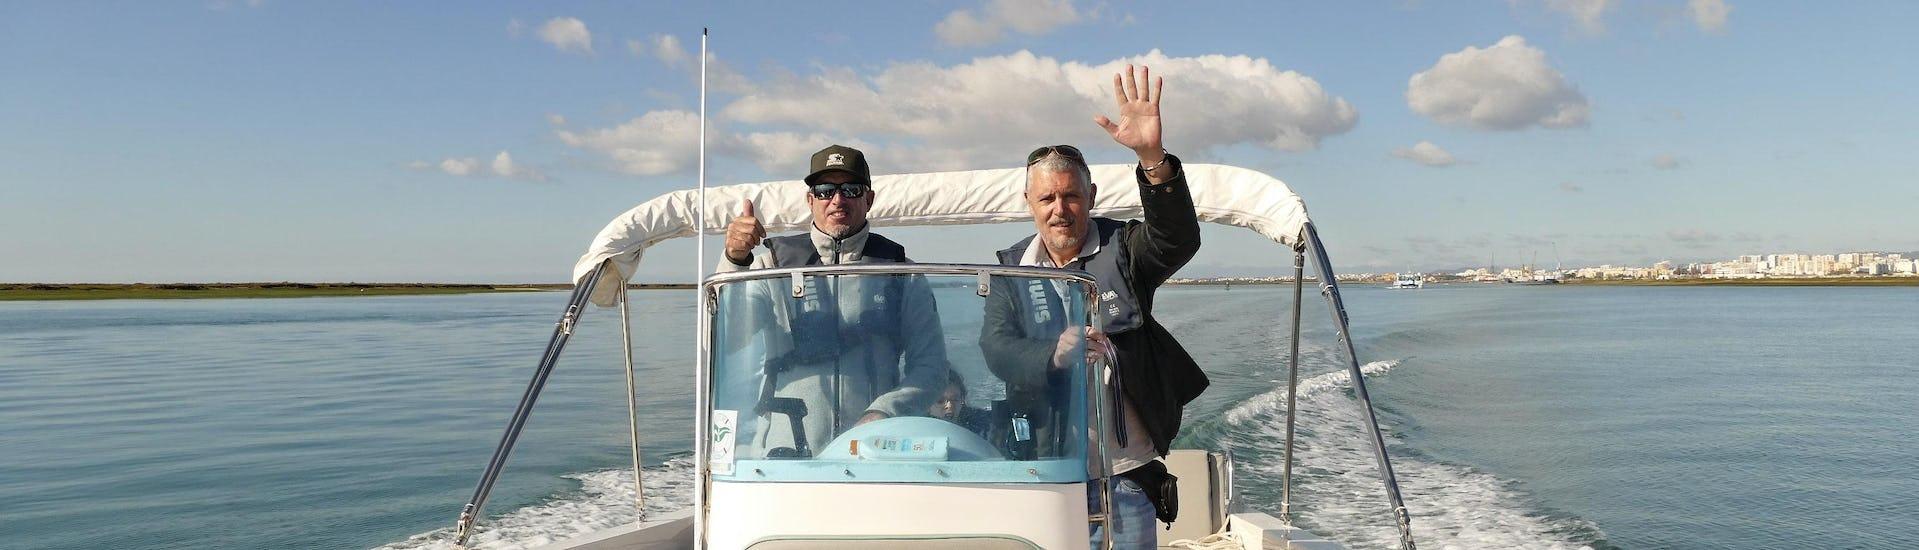 Boat Tour -  Fisheries Route in Faro